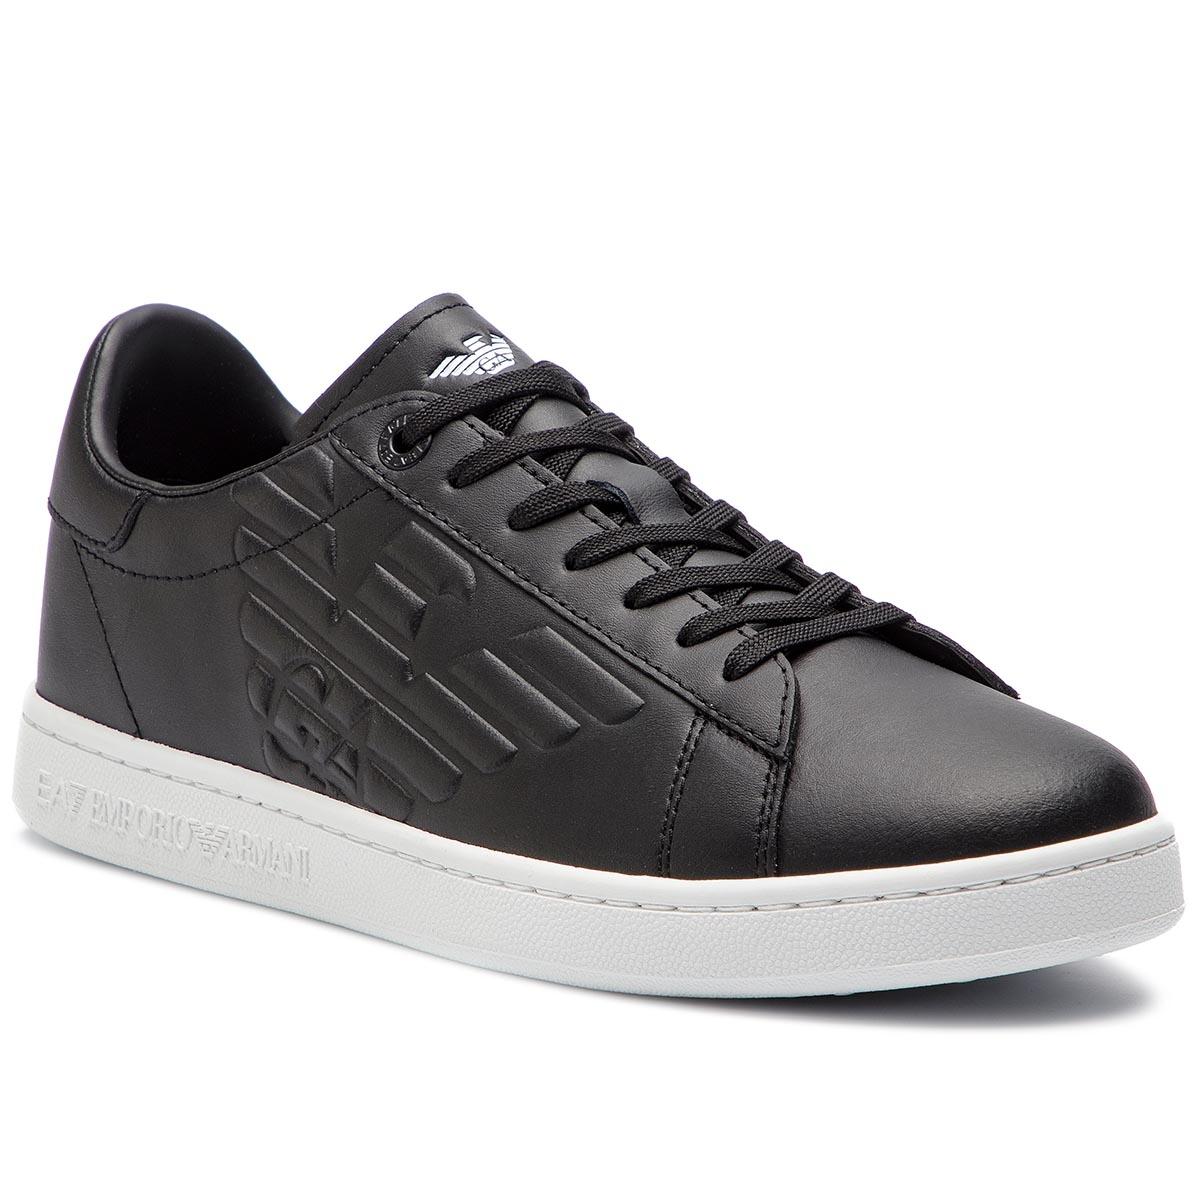 a36dea1a600 Sneakers EA7 EMPORIO ARMANI